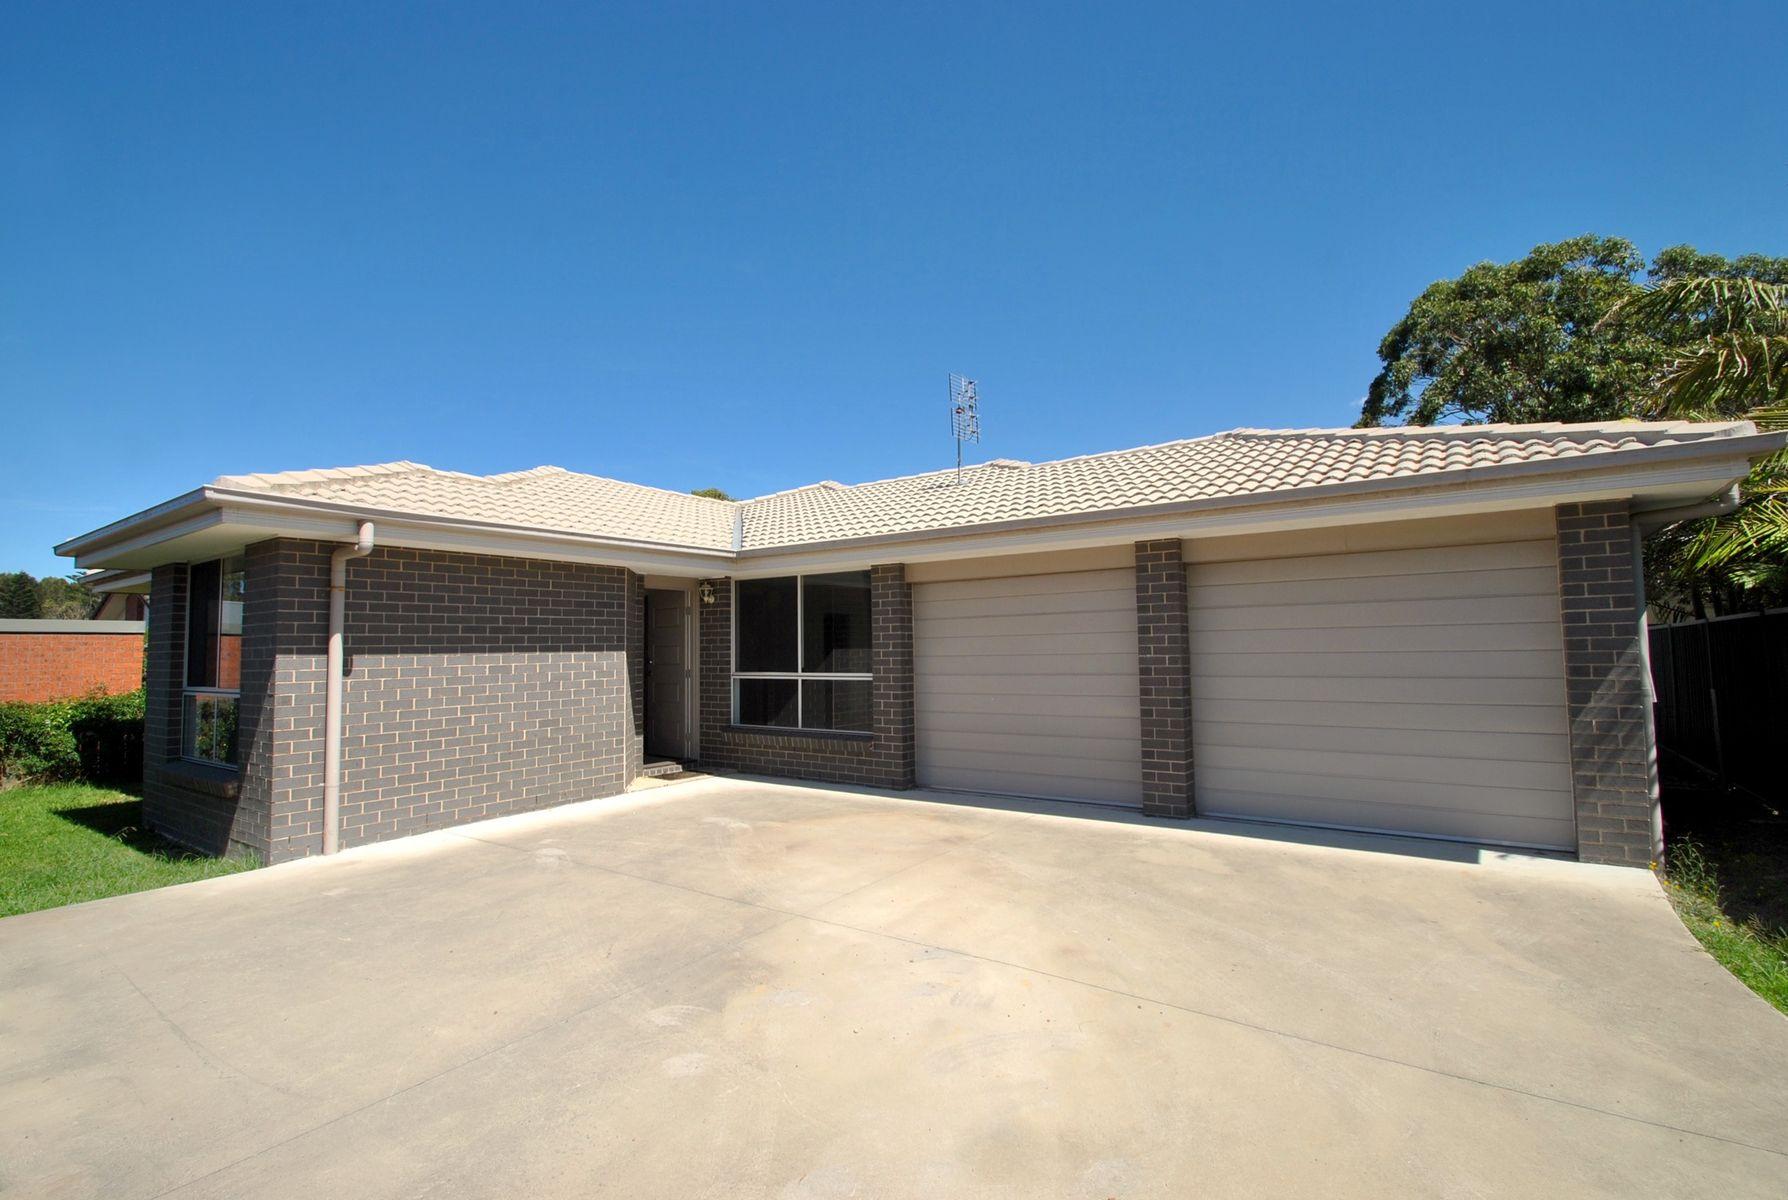 43A Prince Edward Avenue, Culburra Beach, NSW 2540